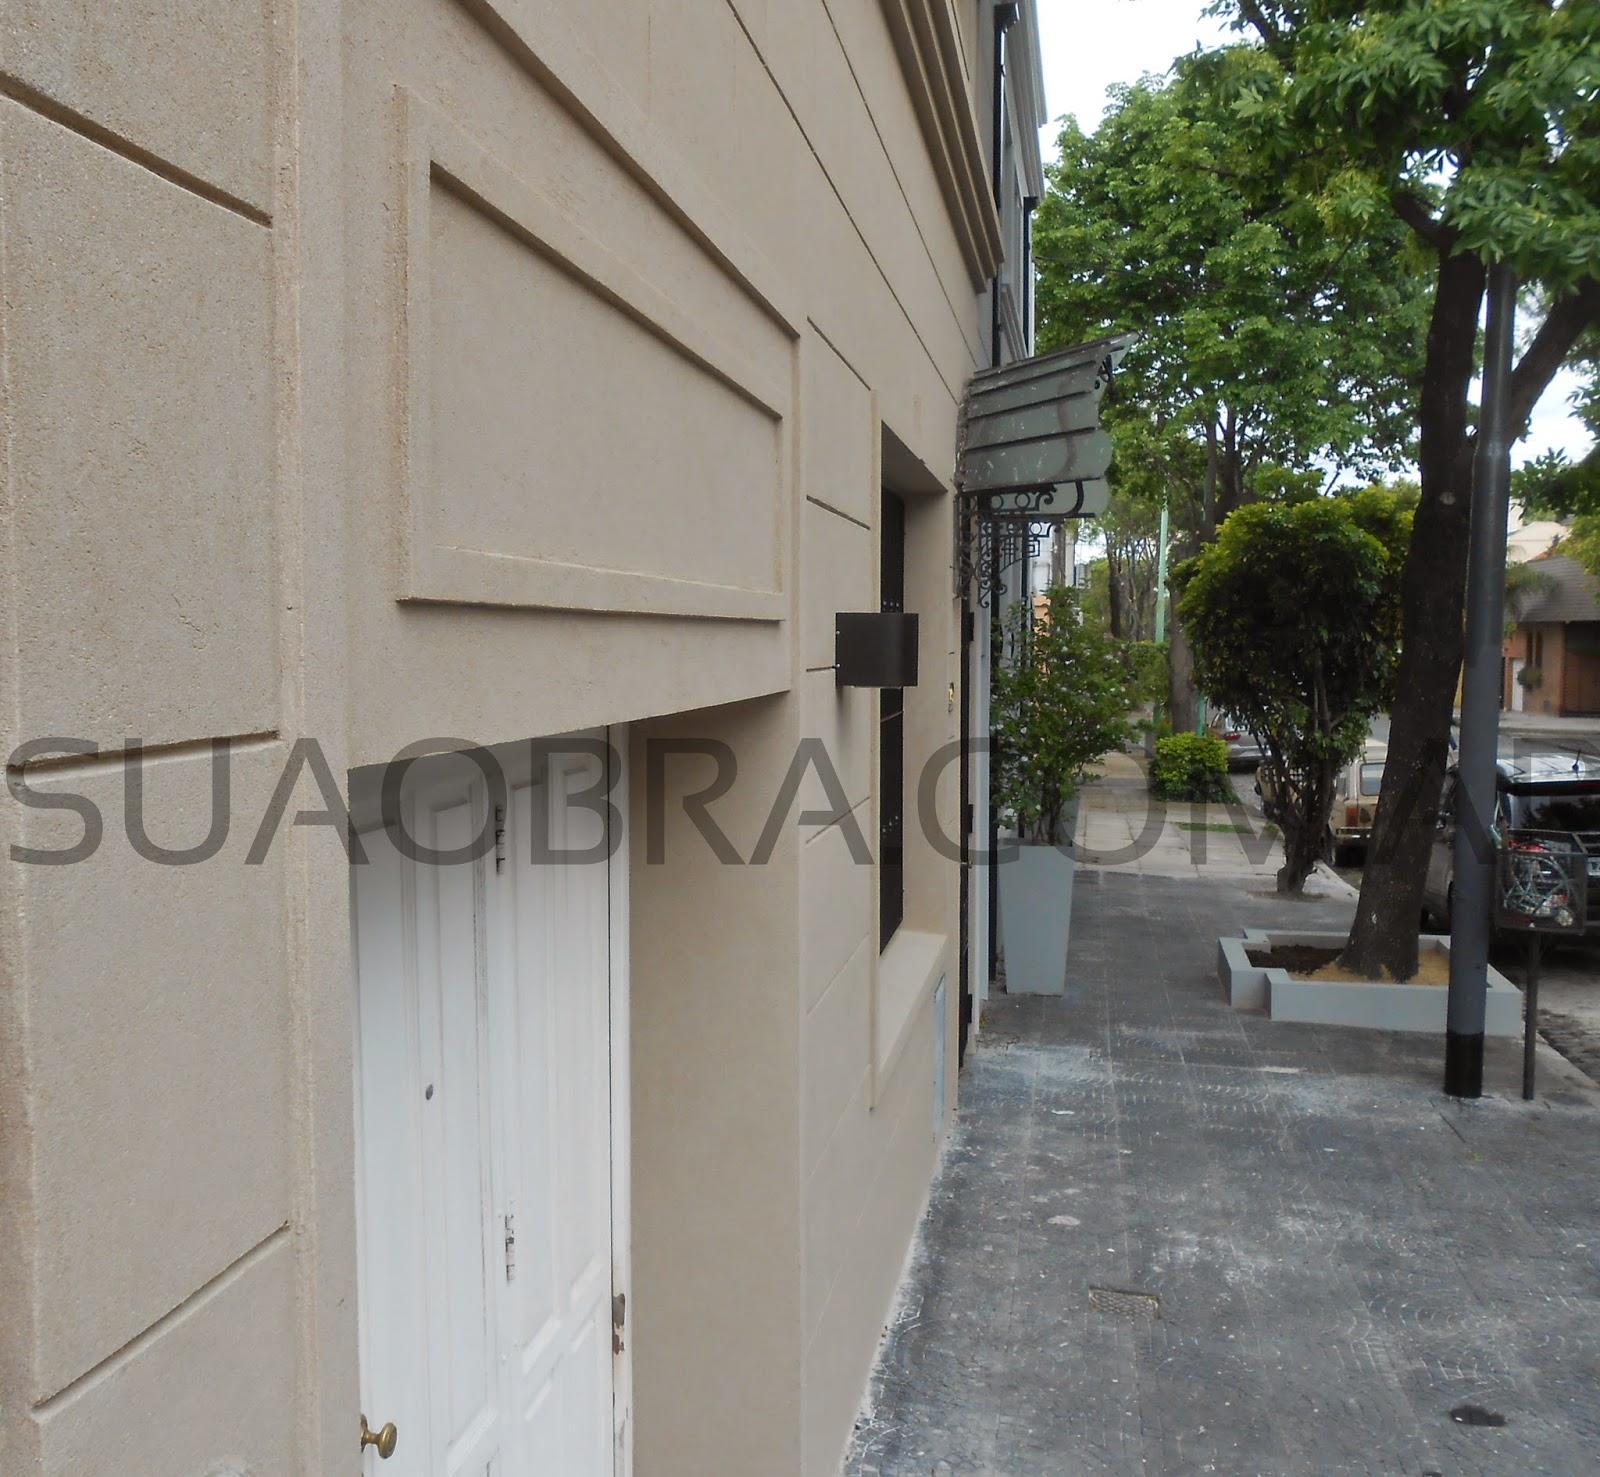 Tarquini revestimiento de paredes exteriores aplicacion for Baules plastico para exterior